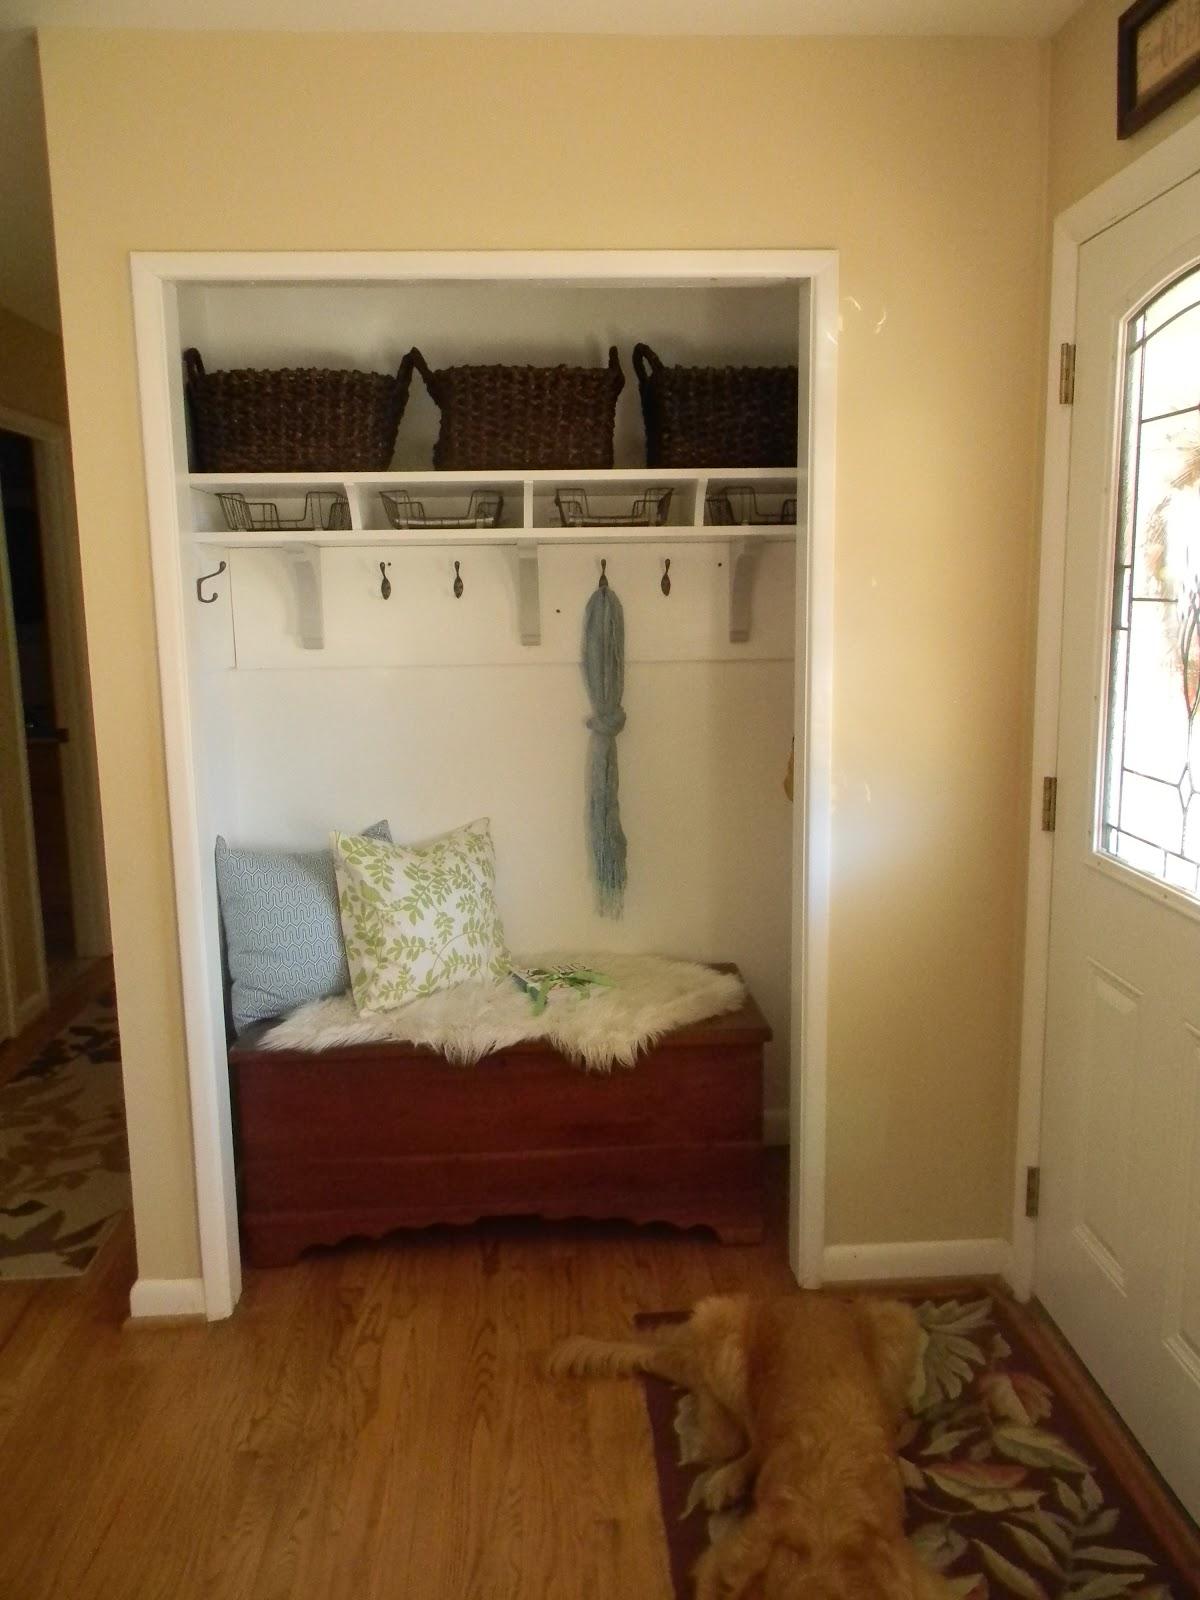 The Diligent One Coat Closet To Mini Mudroom Phase I